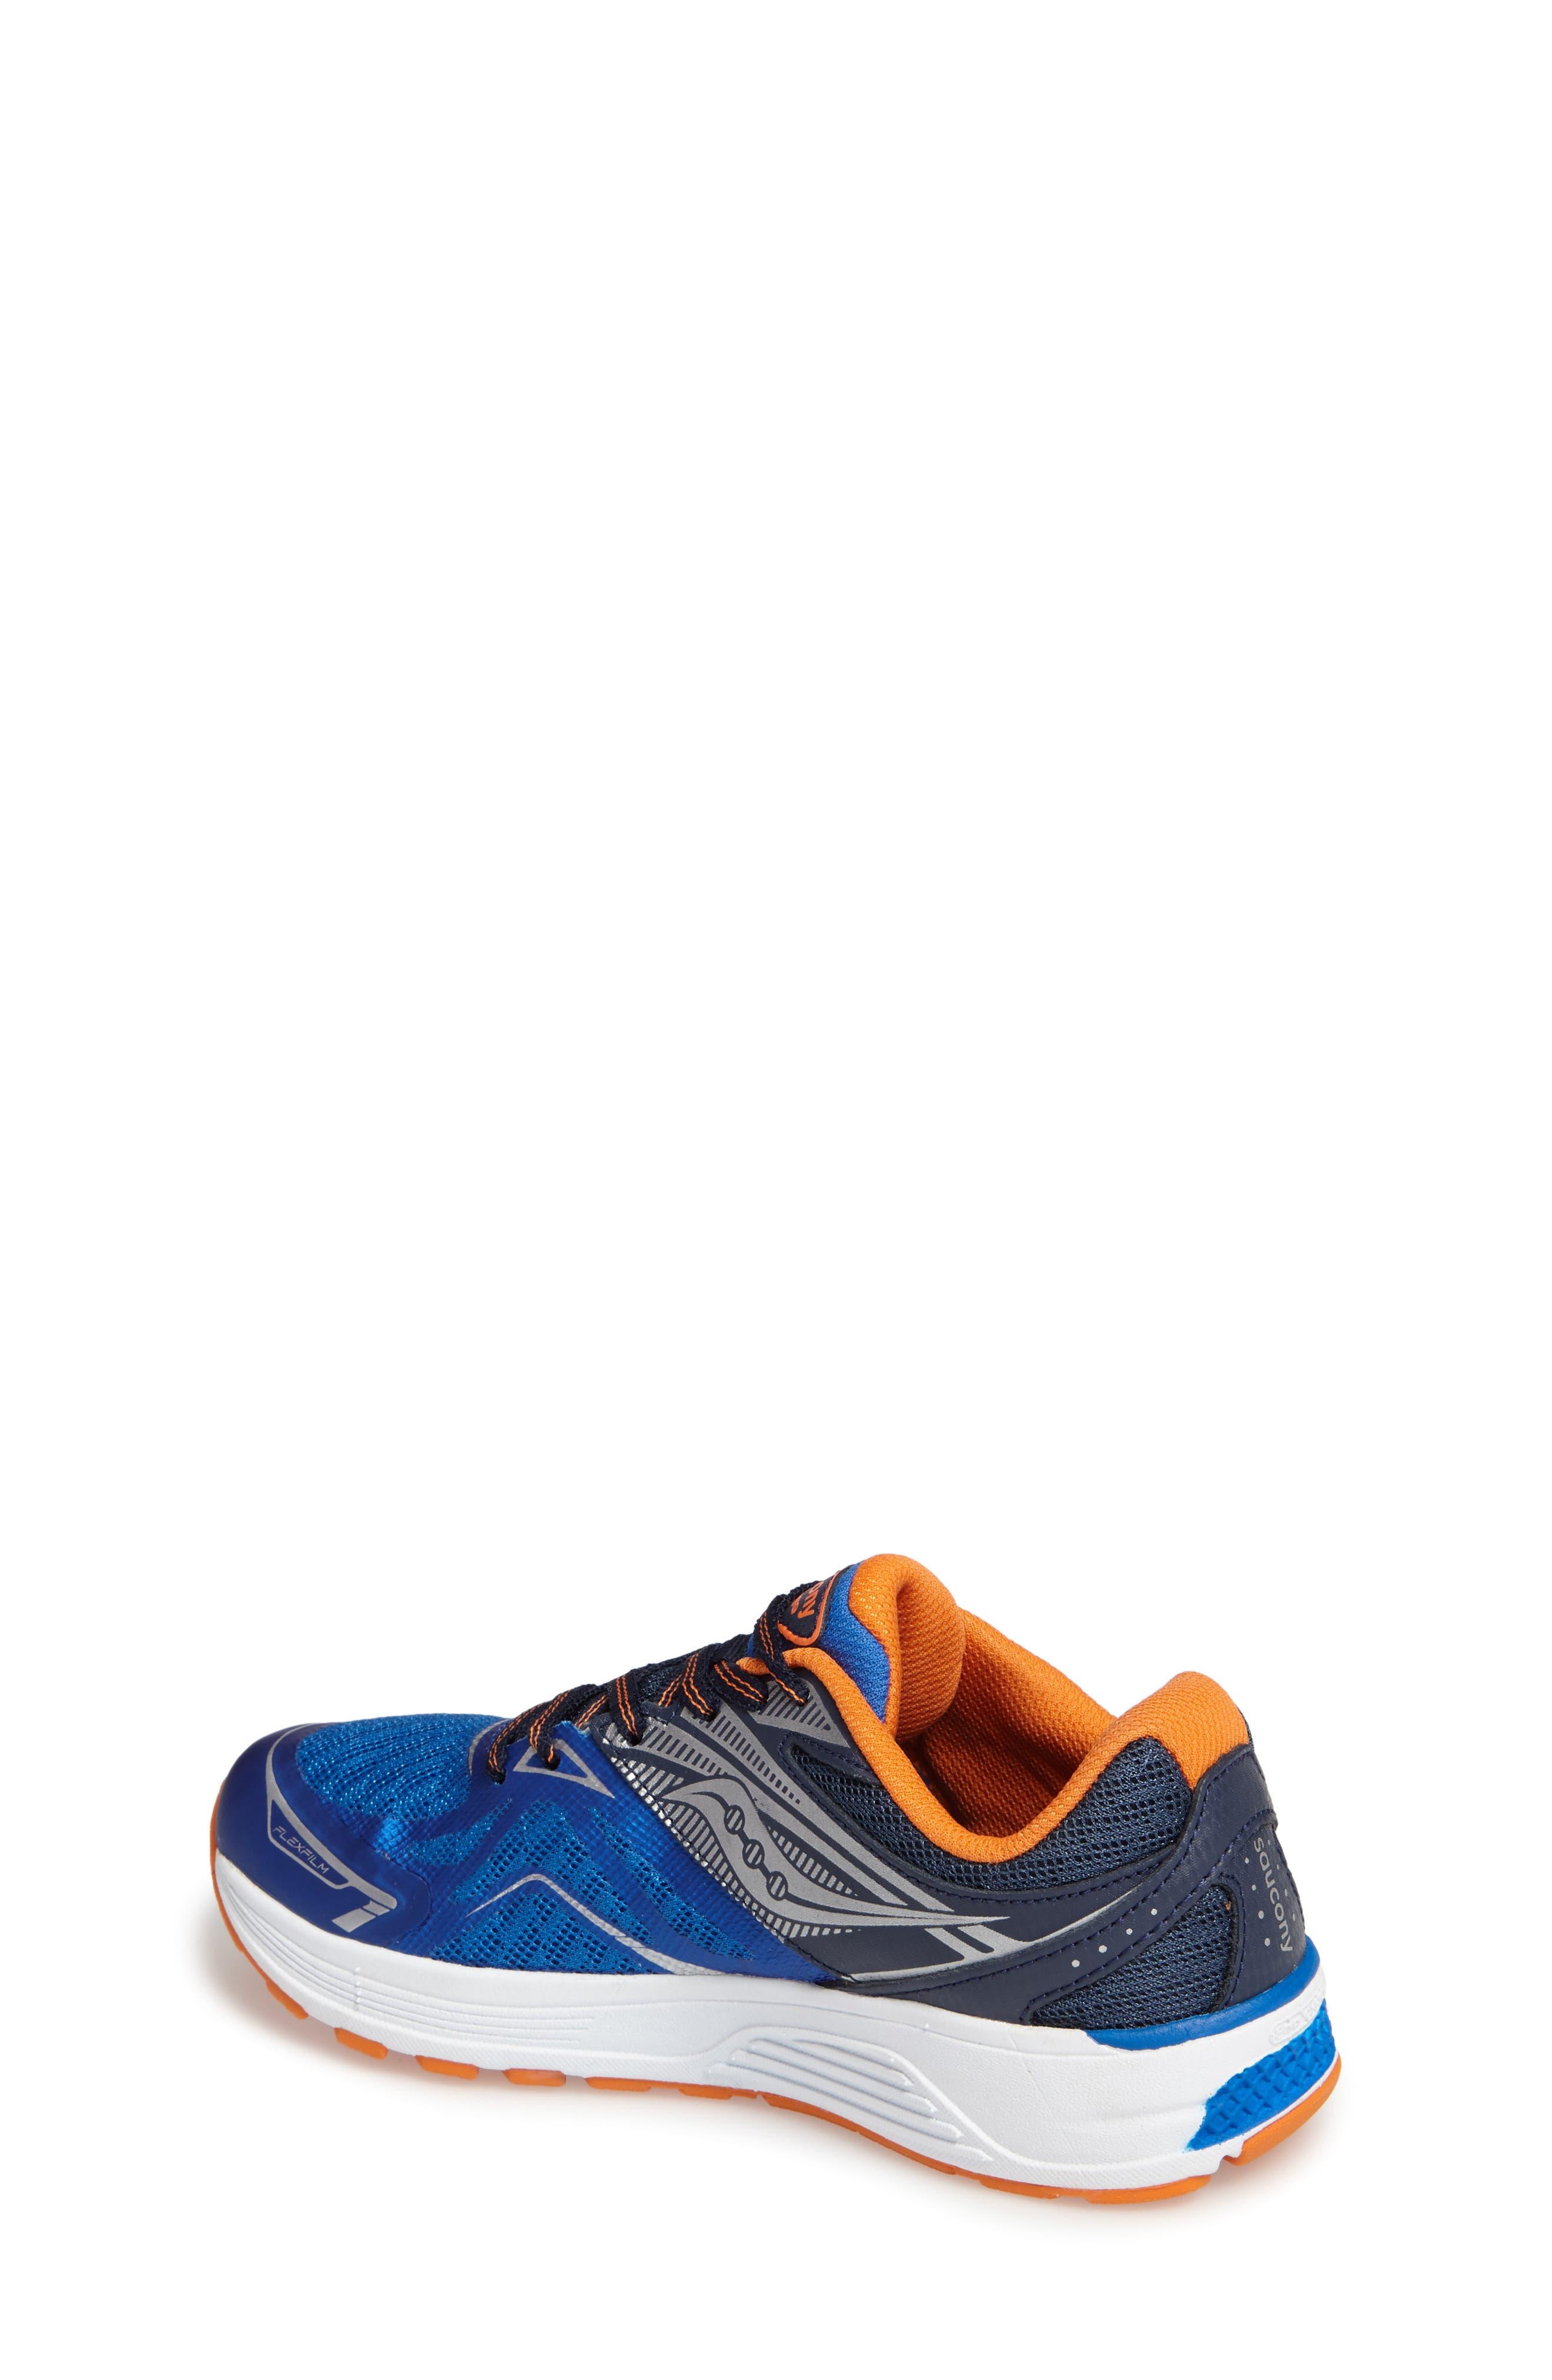 Guide 9 Running Shoe,                             Alternate thumbnail 2, color,                             400